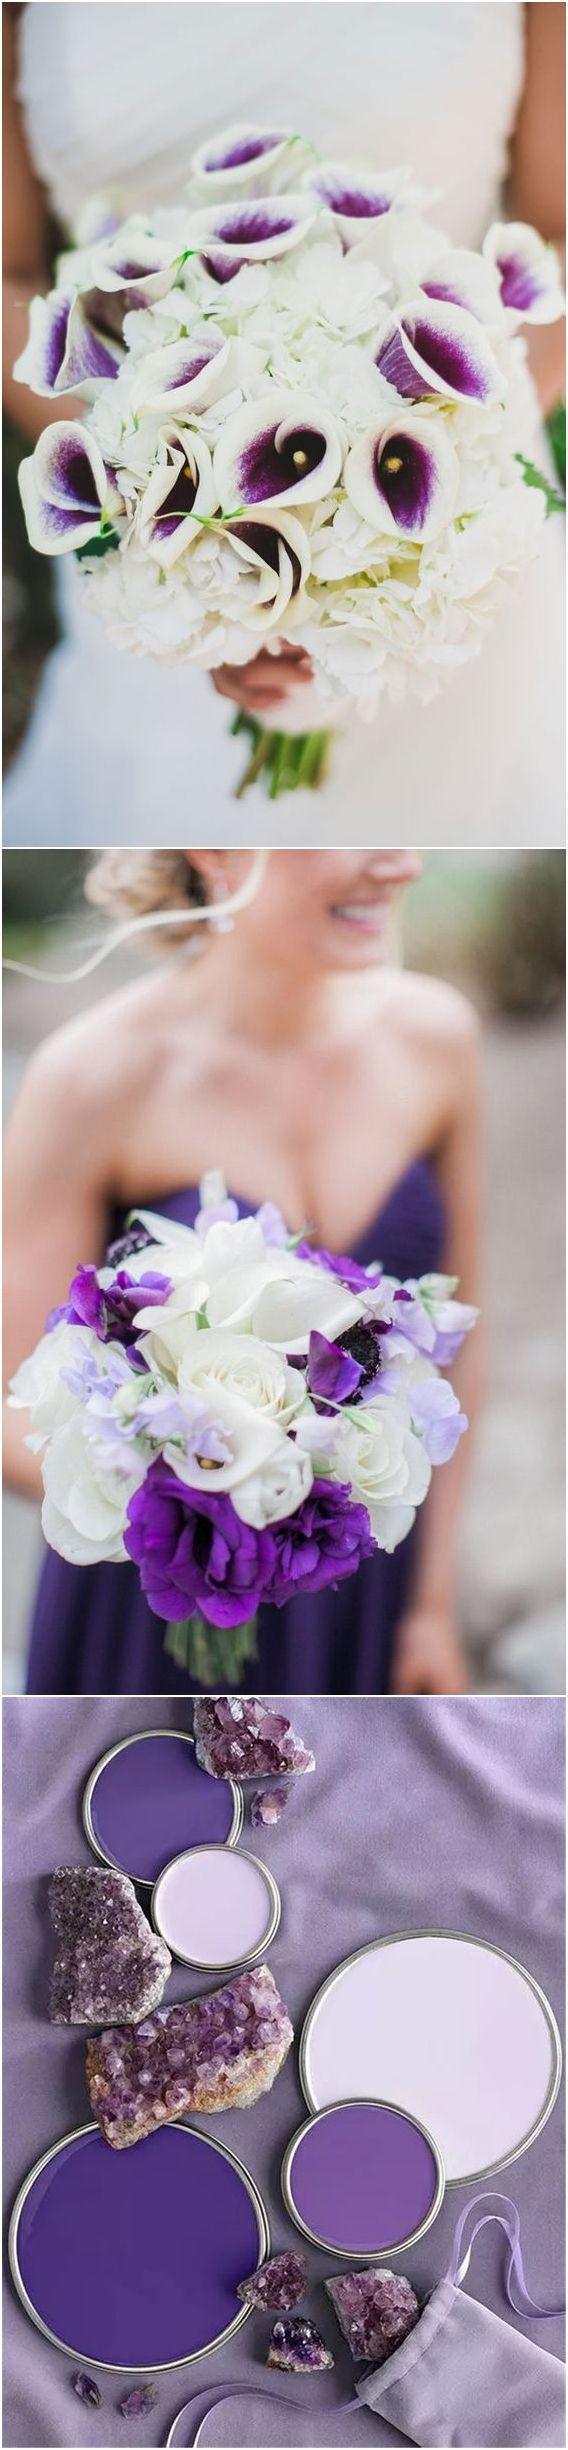 pantone wedding color 2018- Ultra violet ivory wedding color ideas / http://www.deerpearlflowers.com/ultra-violet-wedding-color-palette-idea/